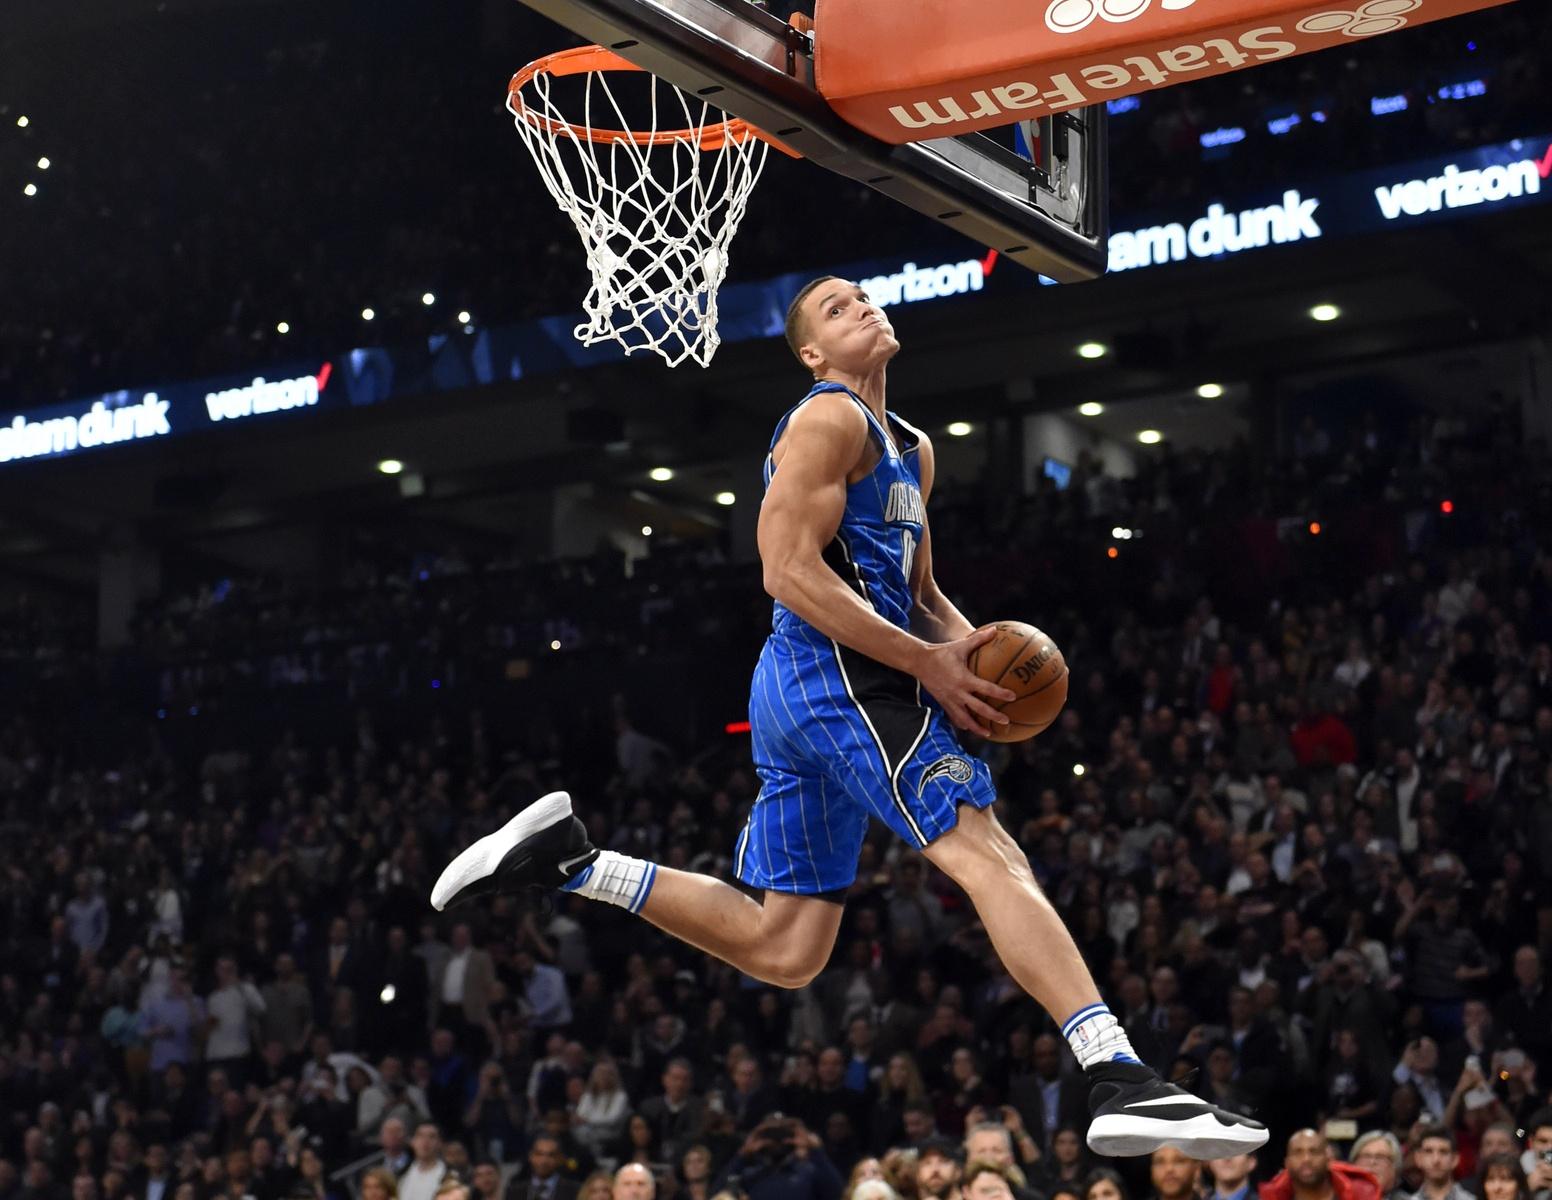 Top 100 NBA players heading into 2017-18 season